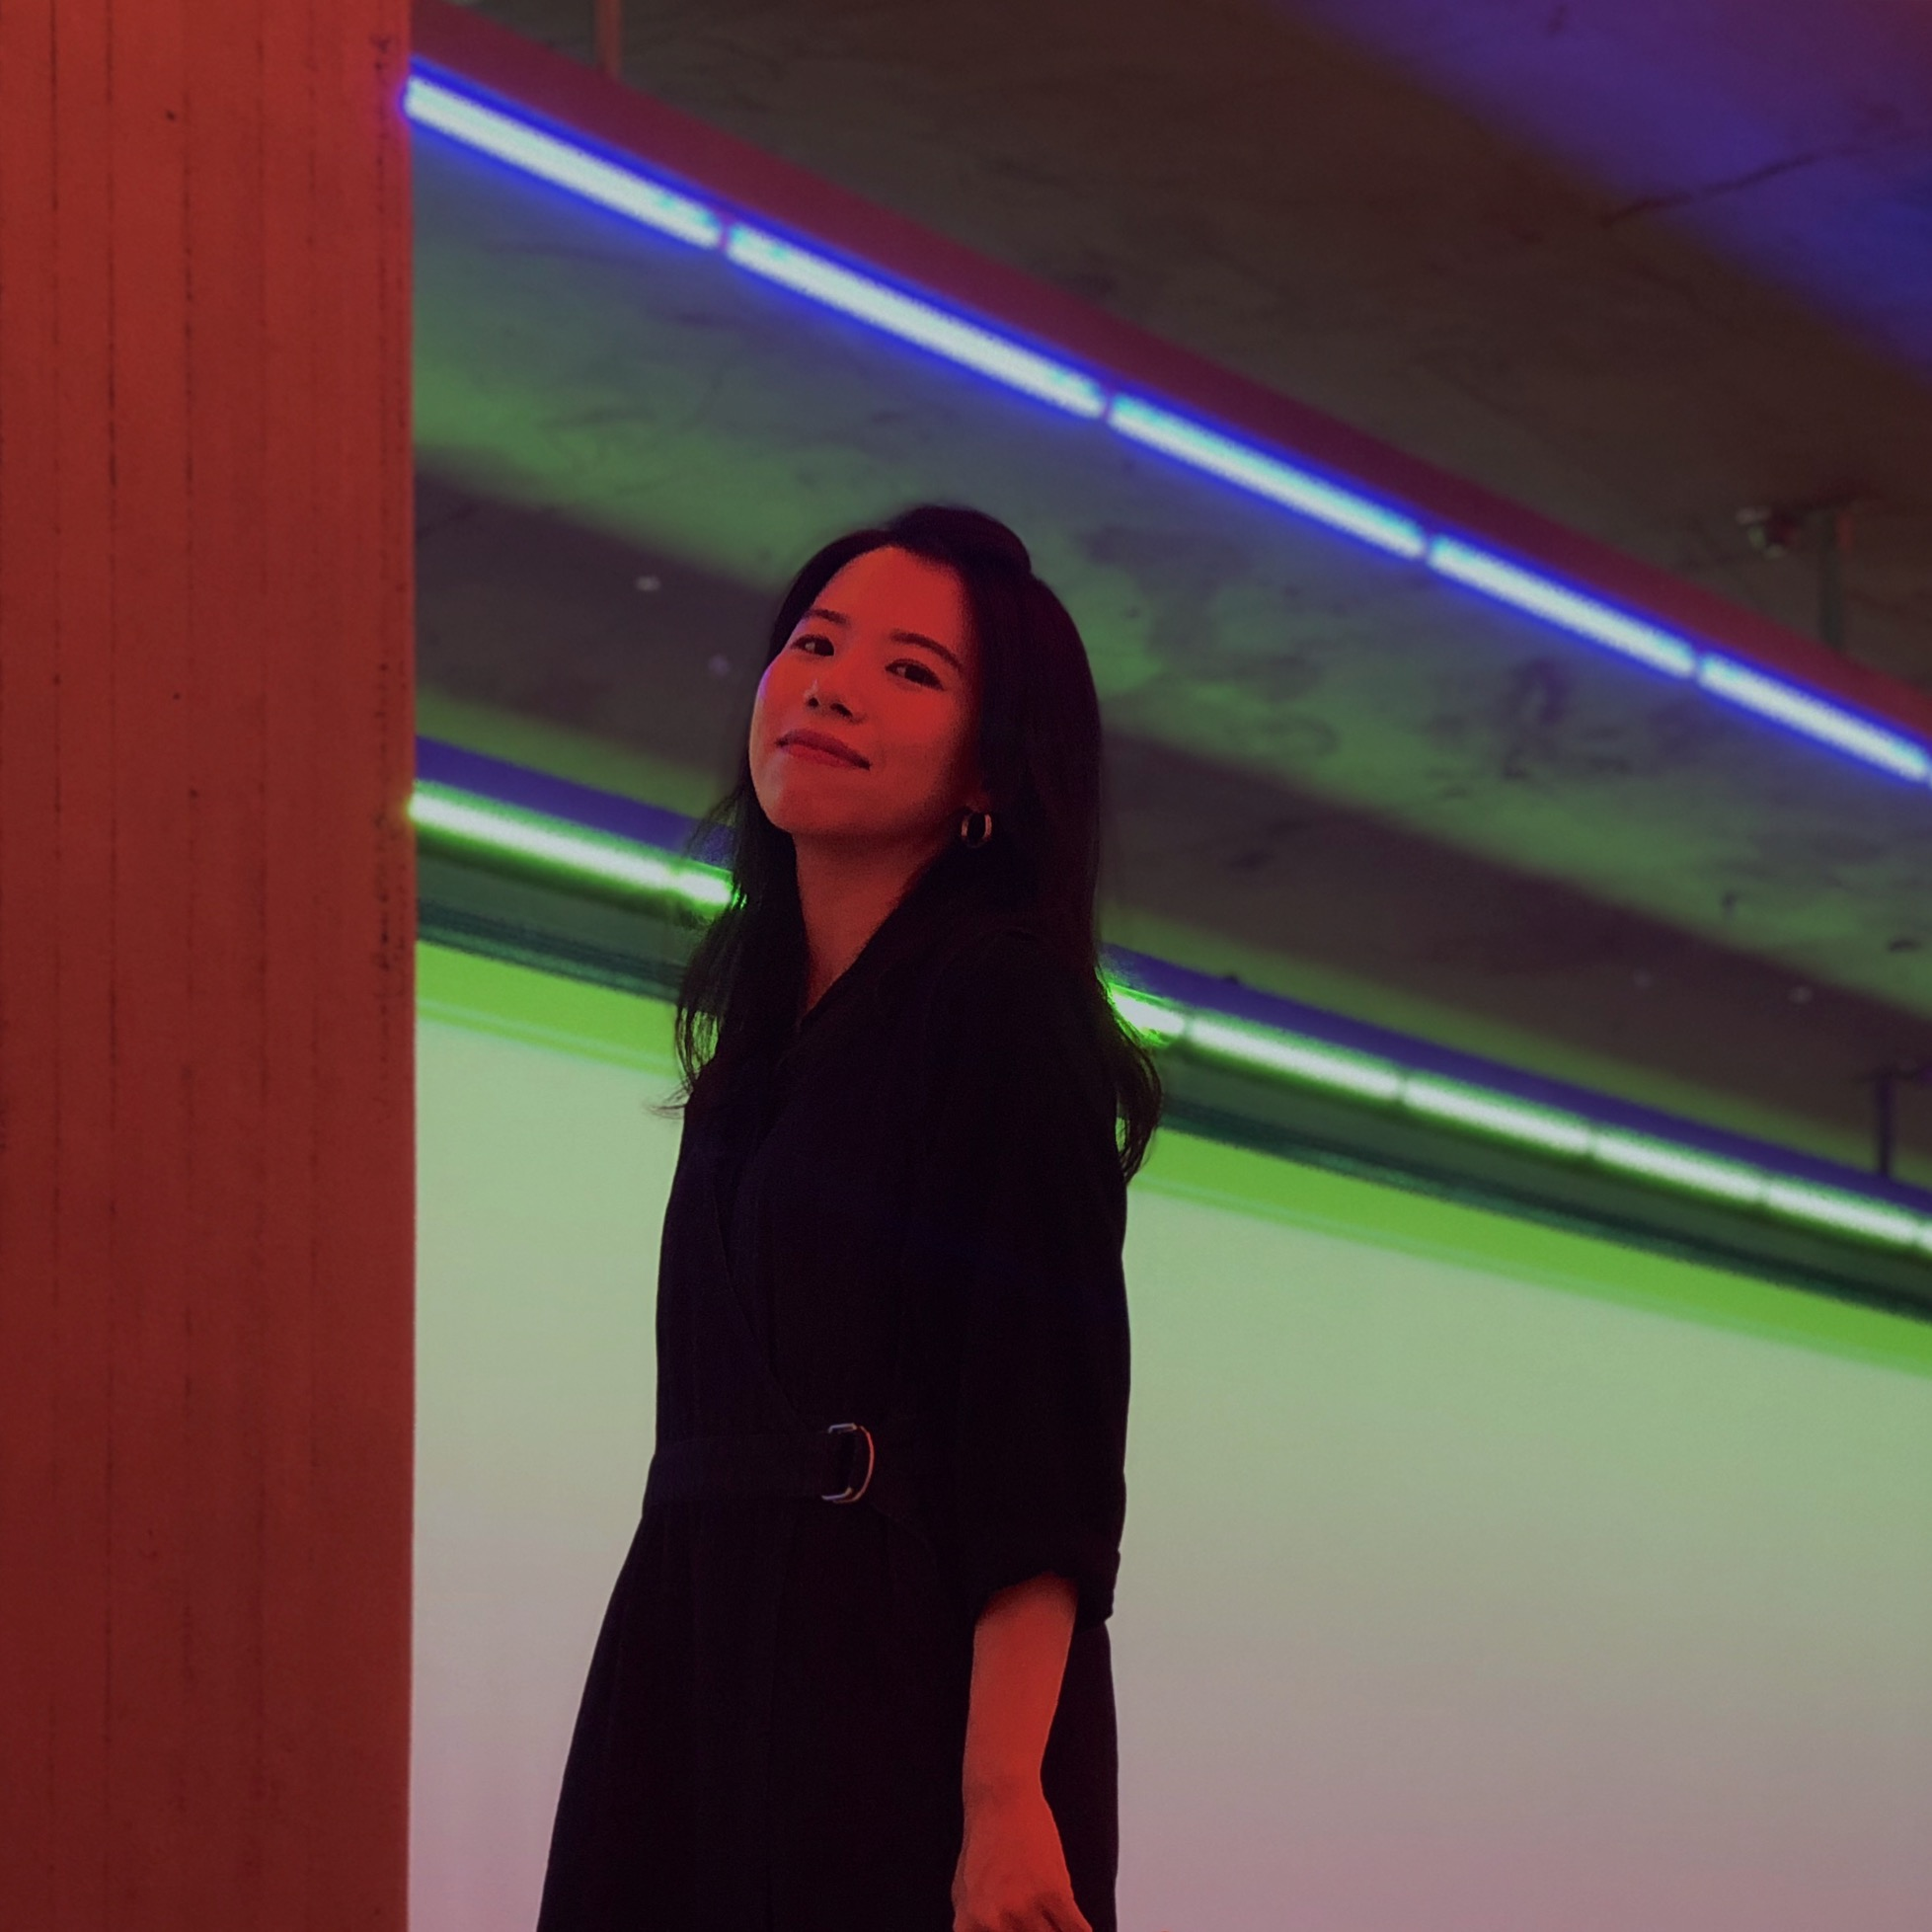 Qun Wang portrait